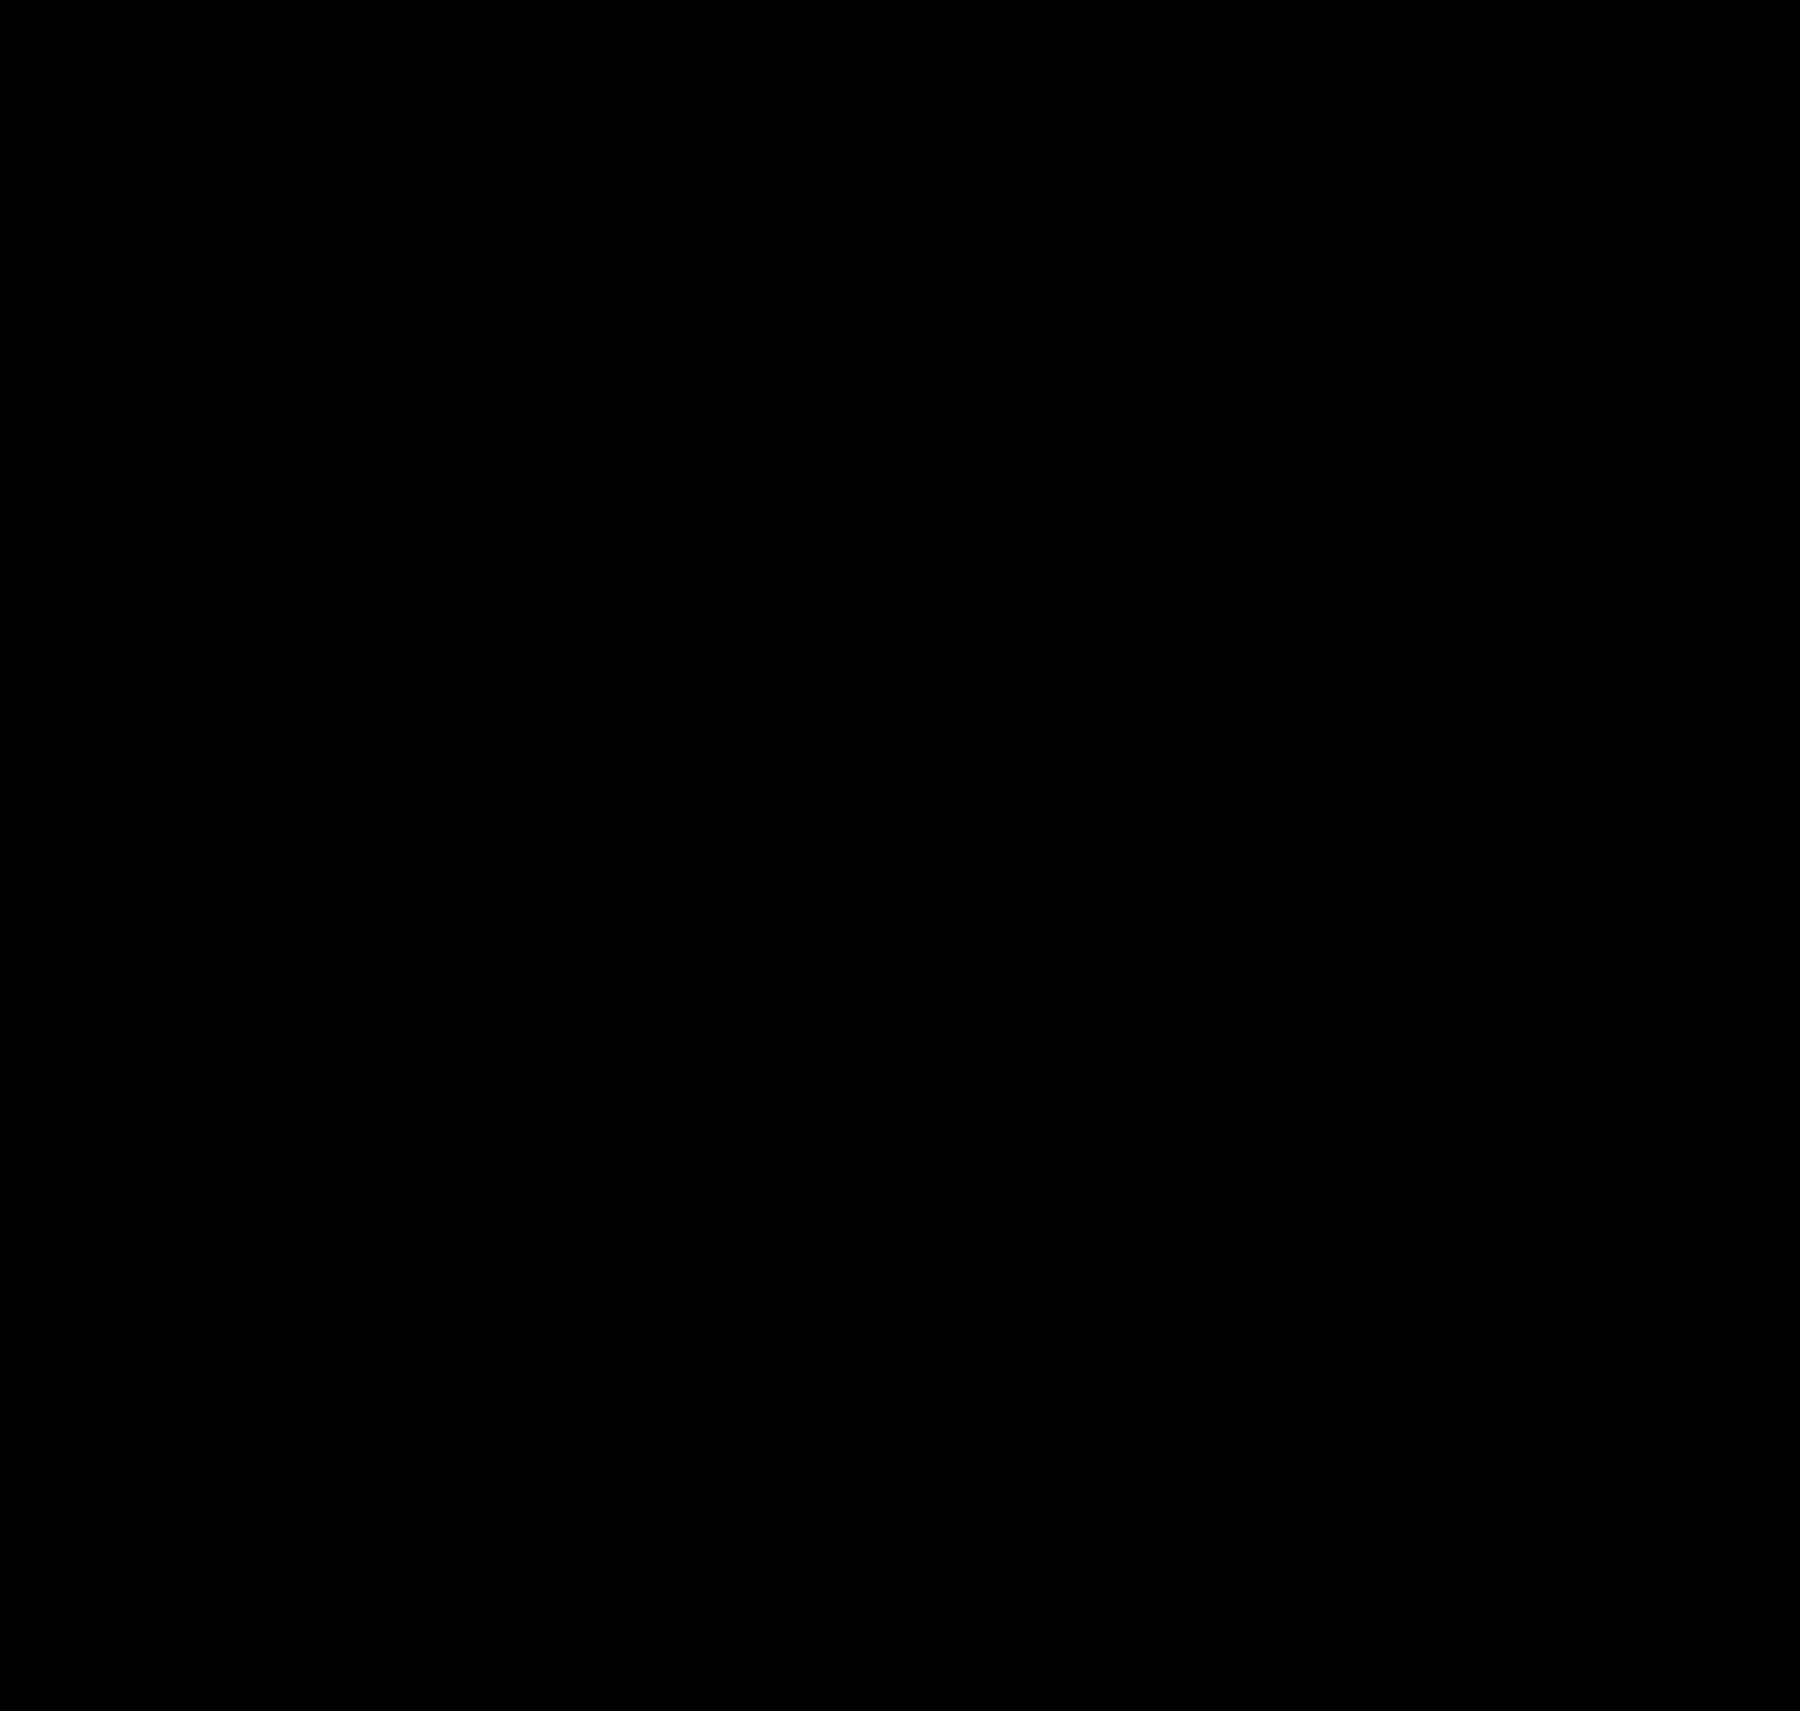 black and white download Vector emblem vintage military. United states logo packs